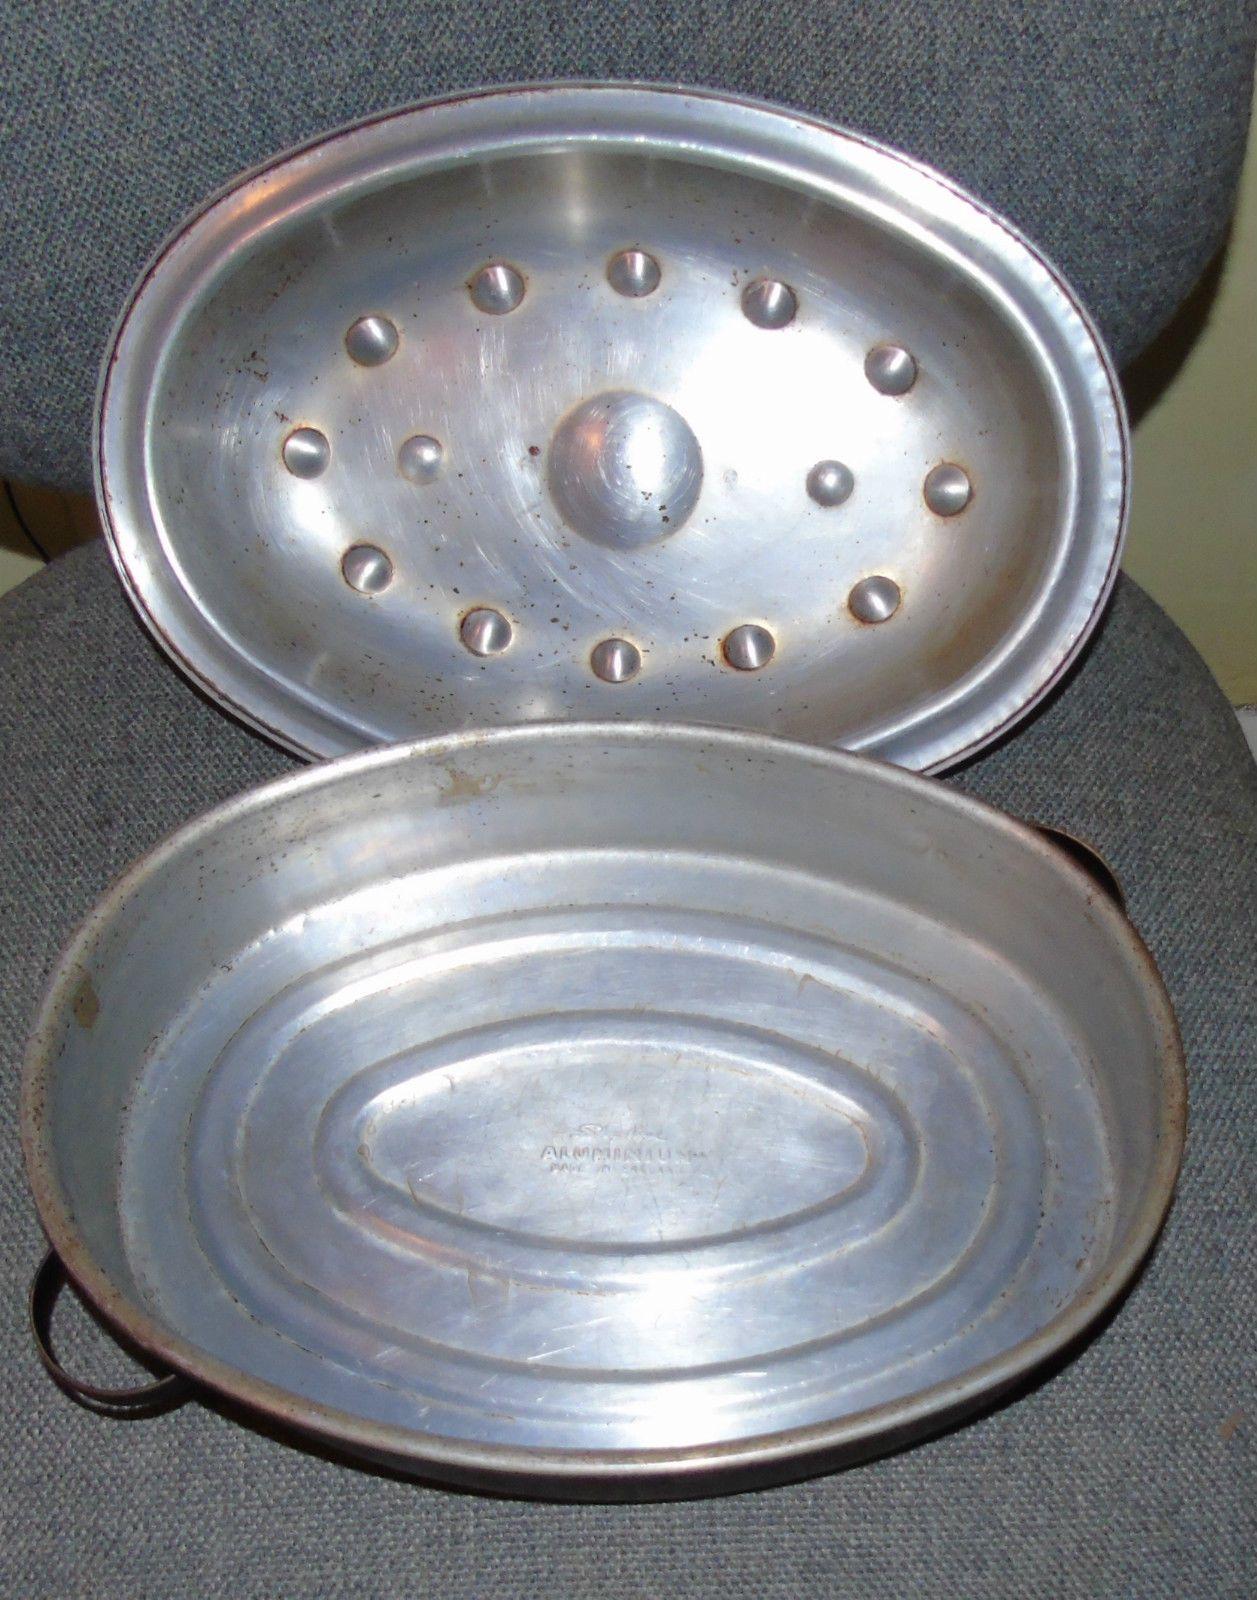 Vintage Skyline Aluminium Shabby Retro Large Oven Roaster Cooking